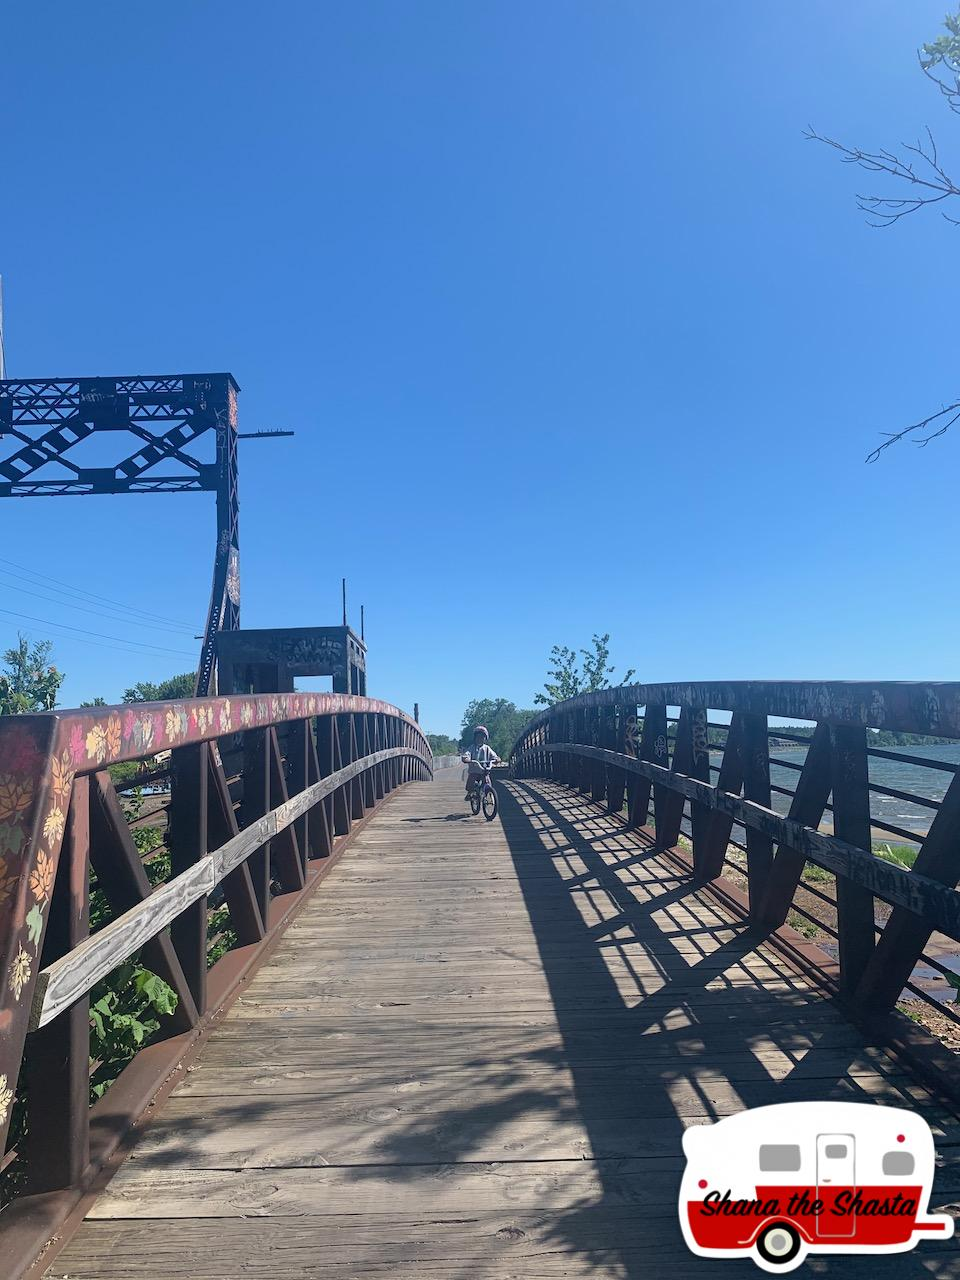 Pedestrian-Bridge-Burlington-Vermont